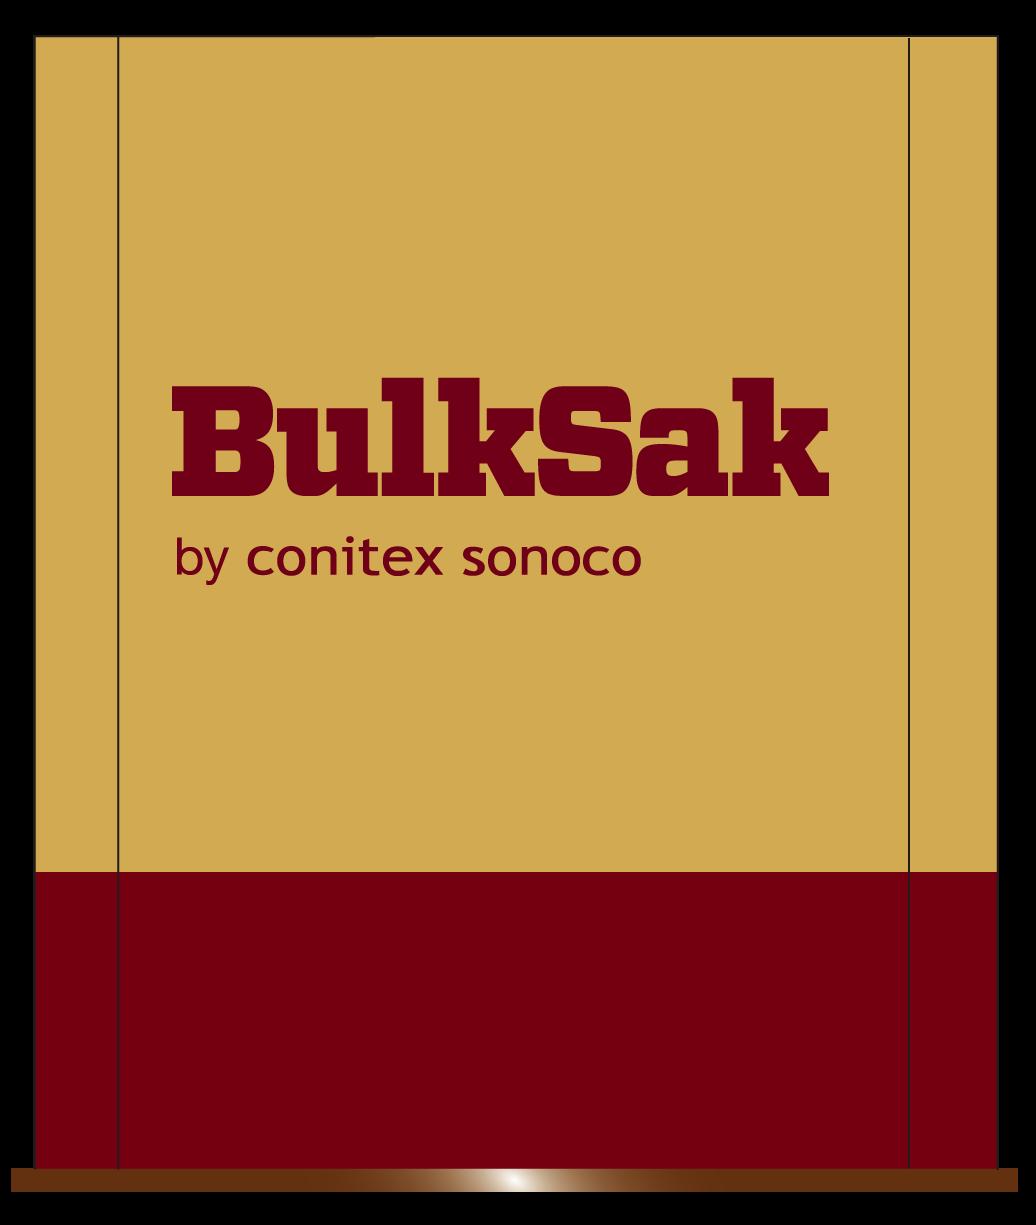 Sewn Bottom Paper Bag by Conitex Sonoco and BulkSak